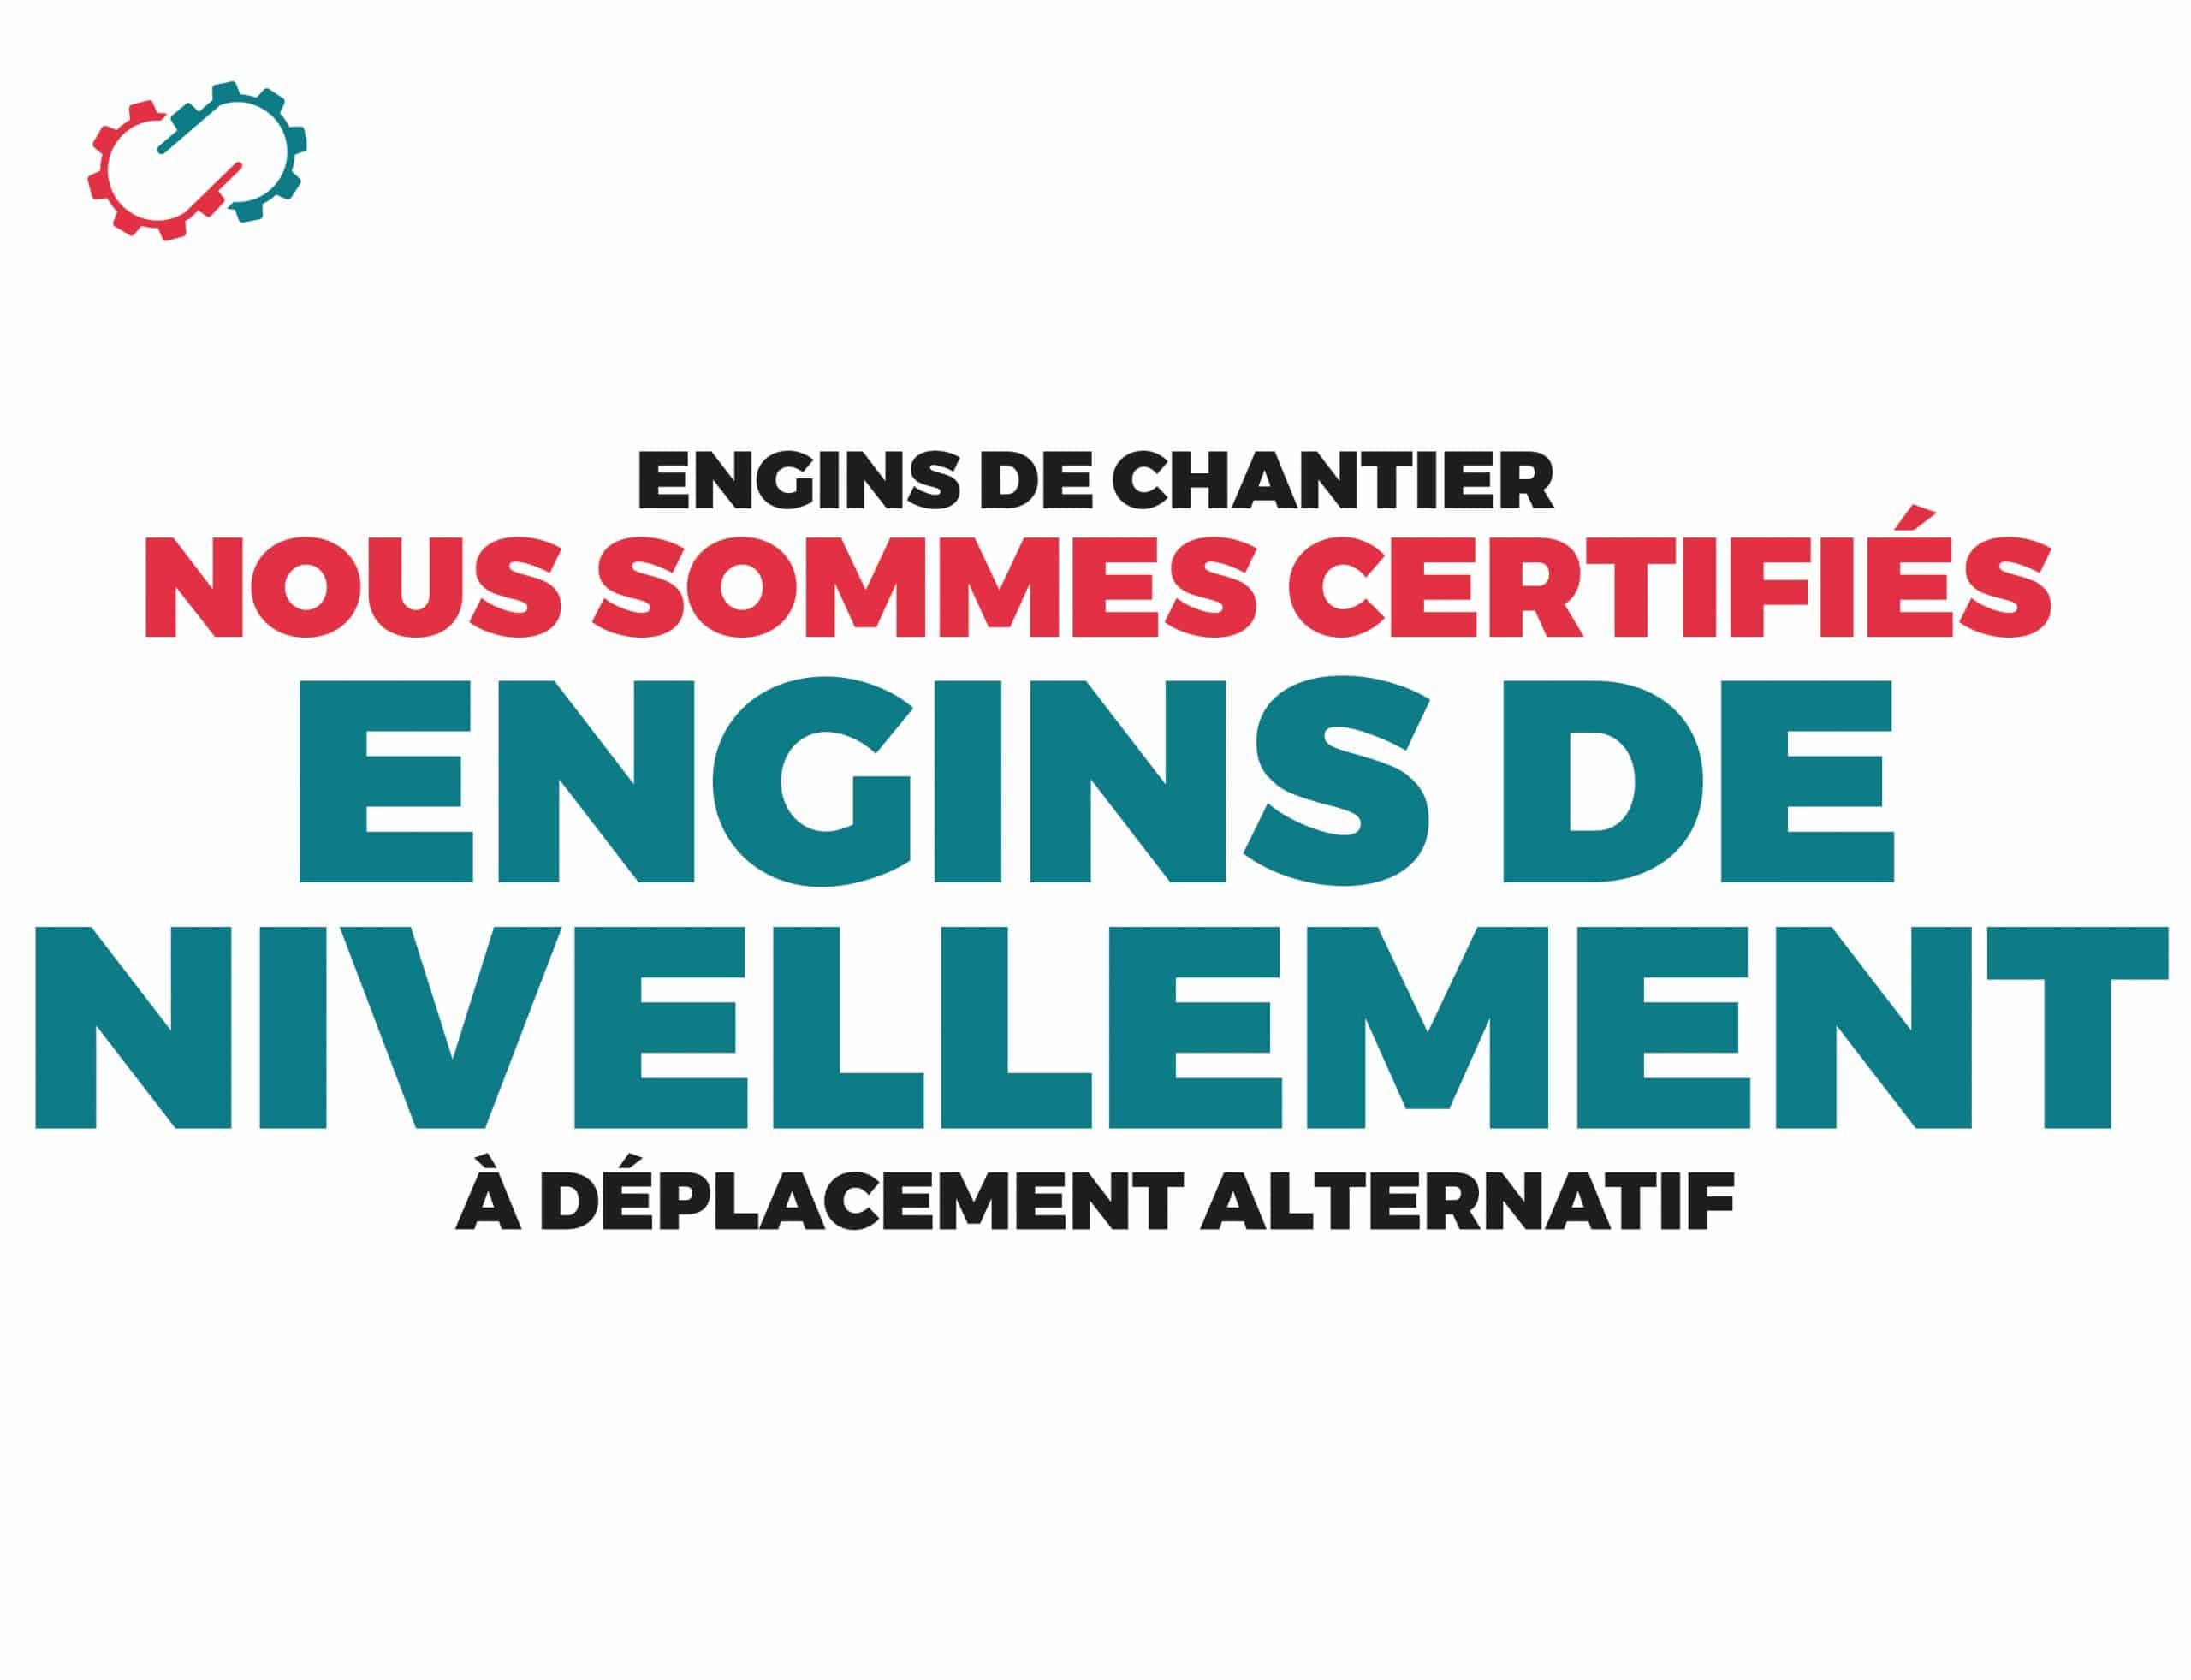 Engins de chantier certification engins de nivellement